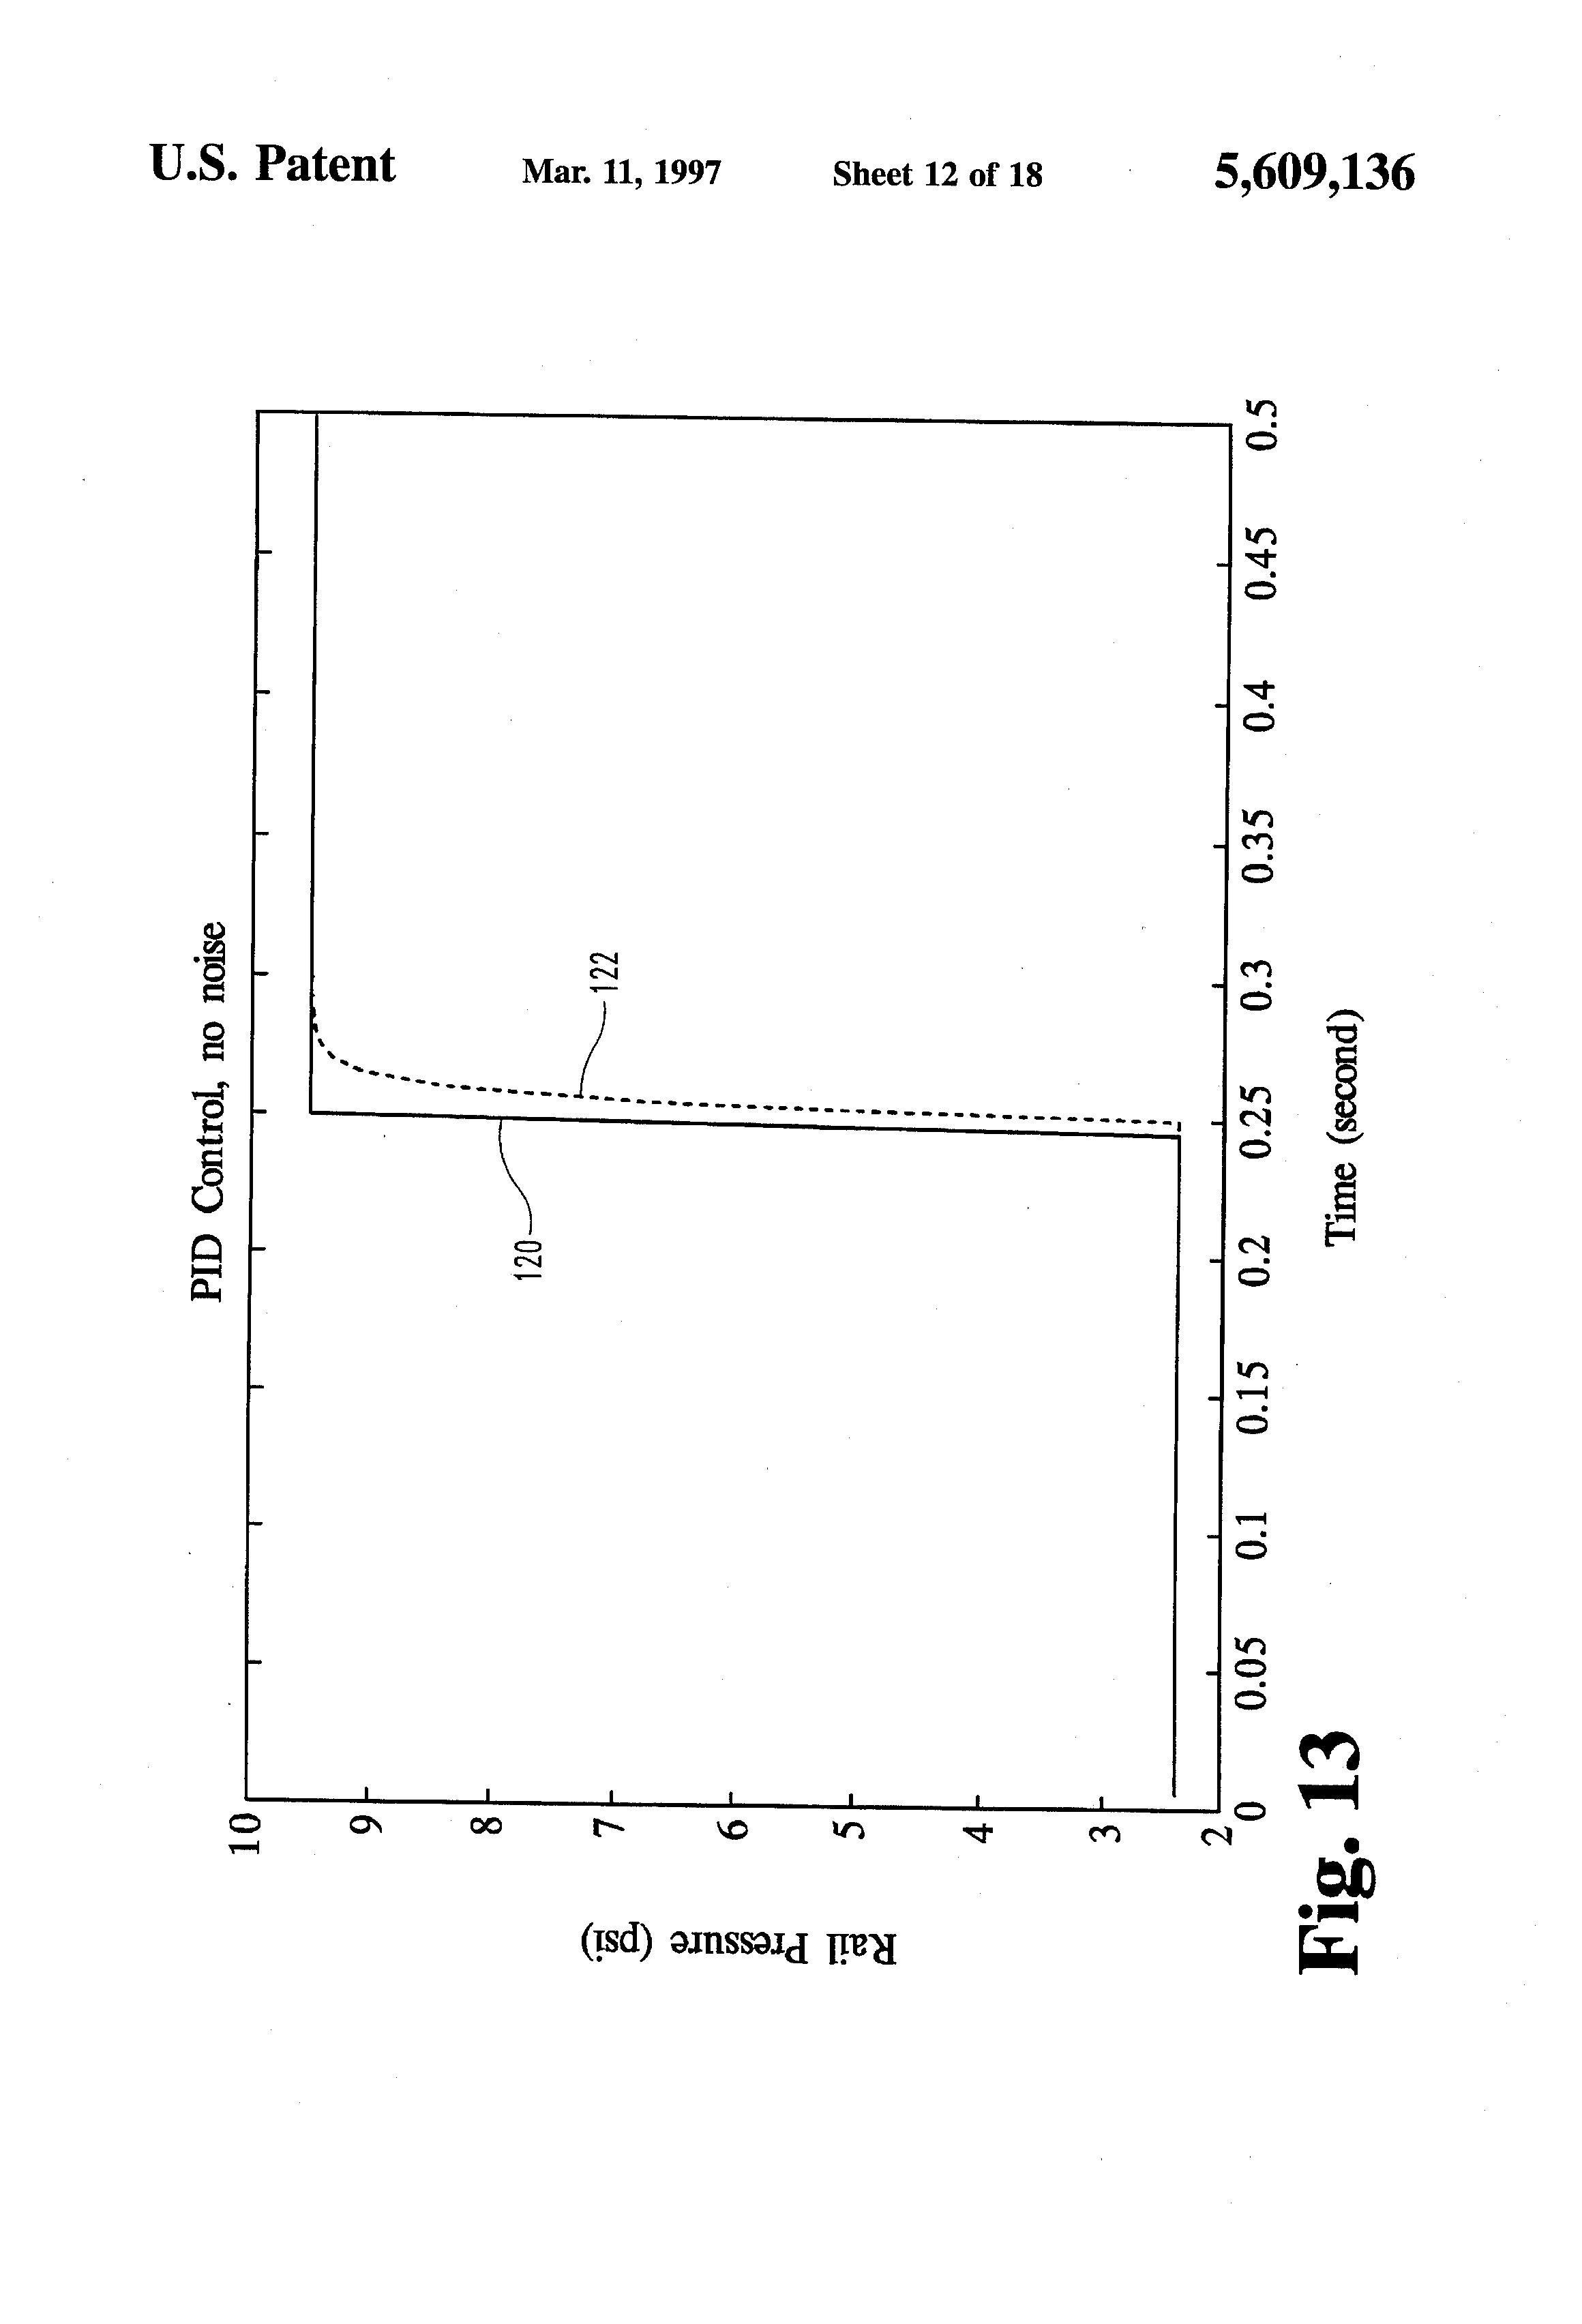 Gas Turbine Engine Fuel System Block Diagram Patent Us Model Predictive Control for Hpi Closed Loop Fuel Of Gas Turbine Engine Fuel System Block Diagram